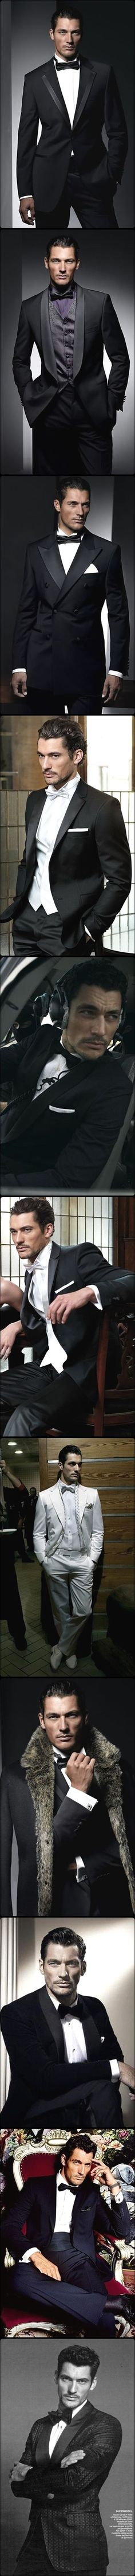 MODEL: DAVID GANDY - Black tie attire | The House of Beccaria